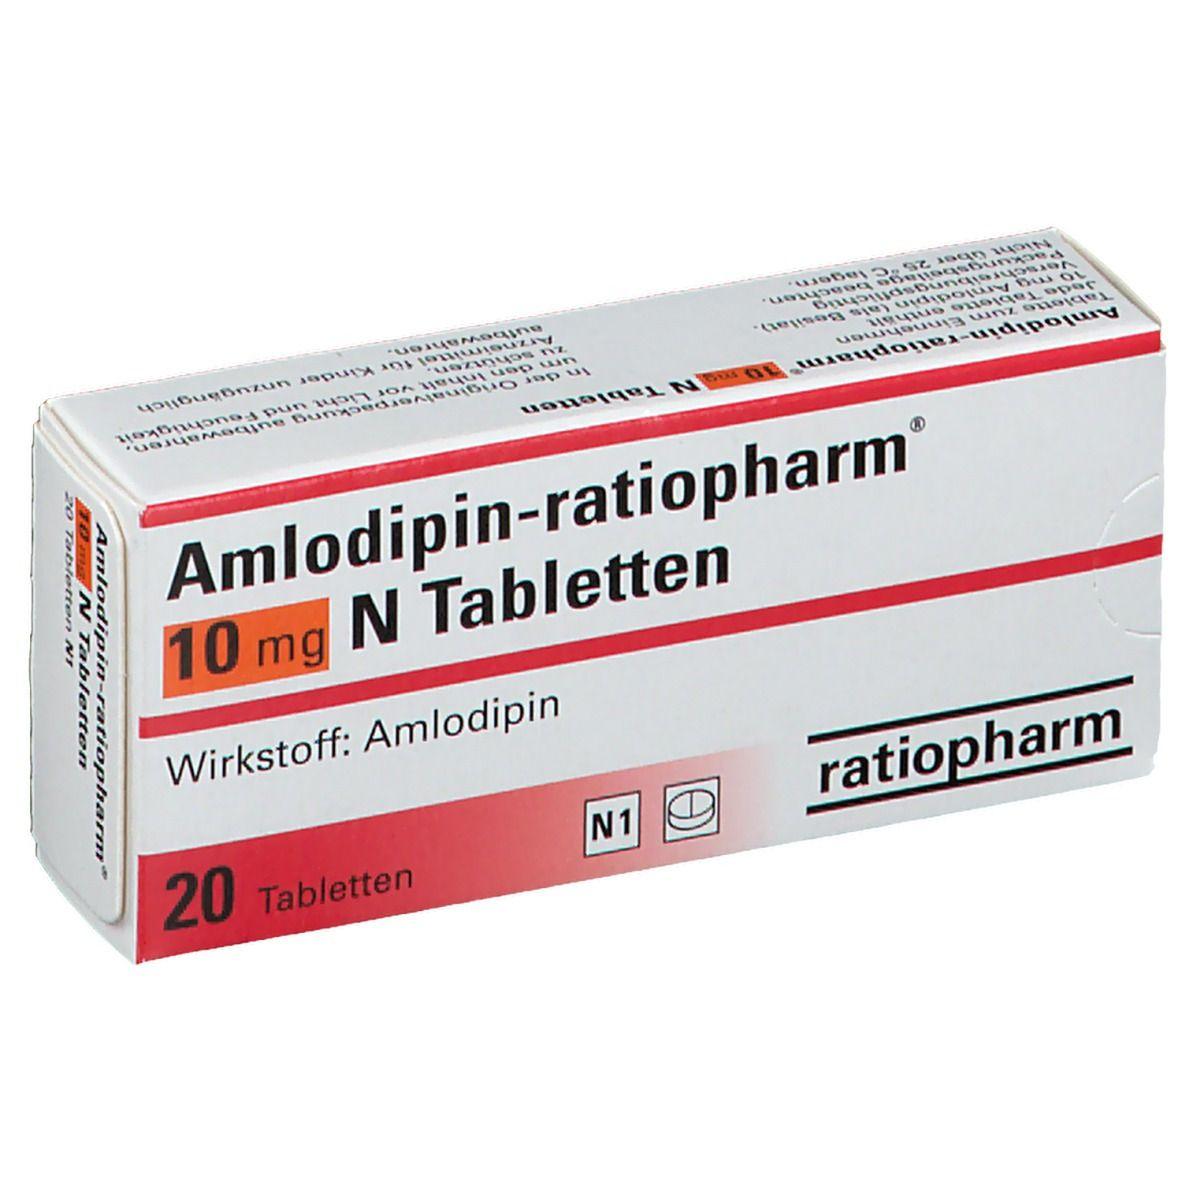 AMLODIPIN ratiopharm 10 mg N Tabletten